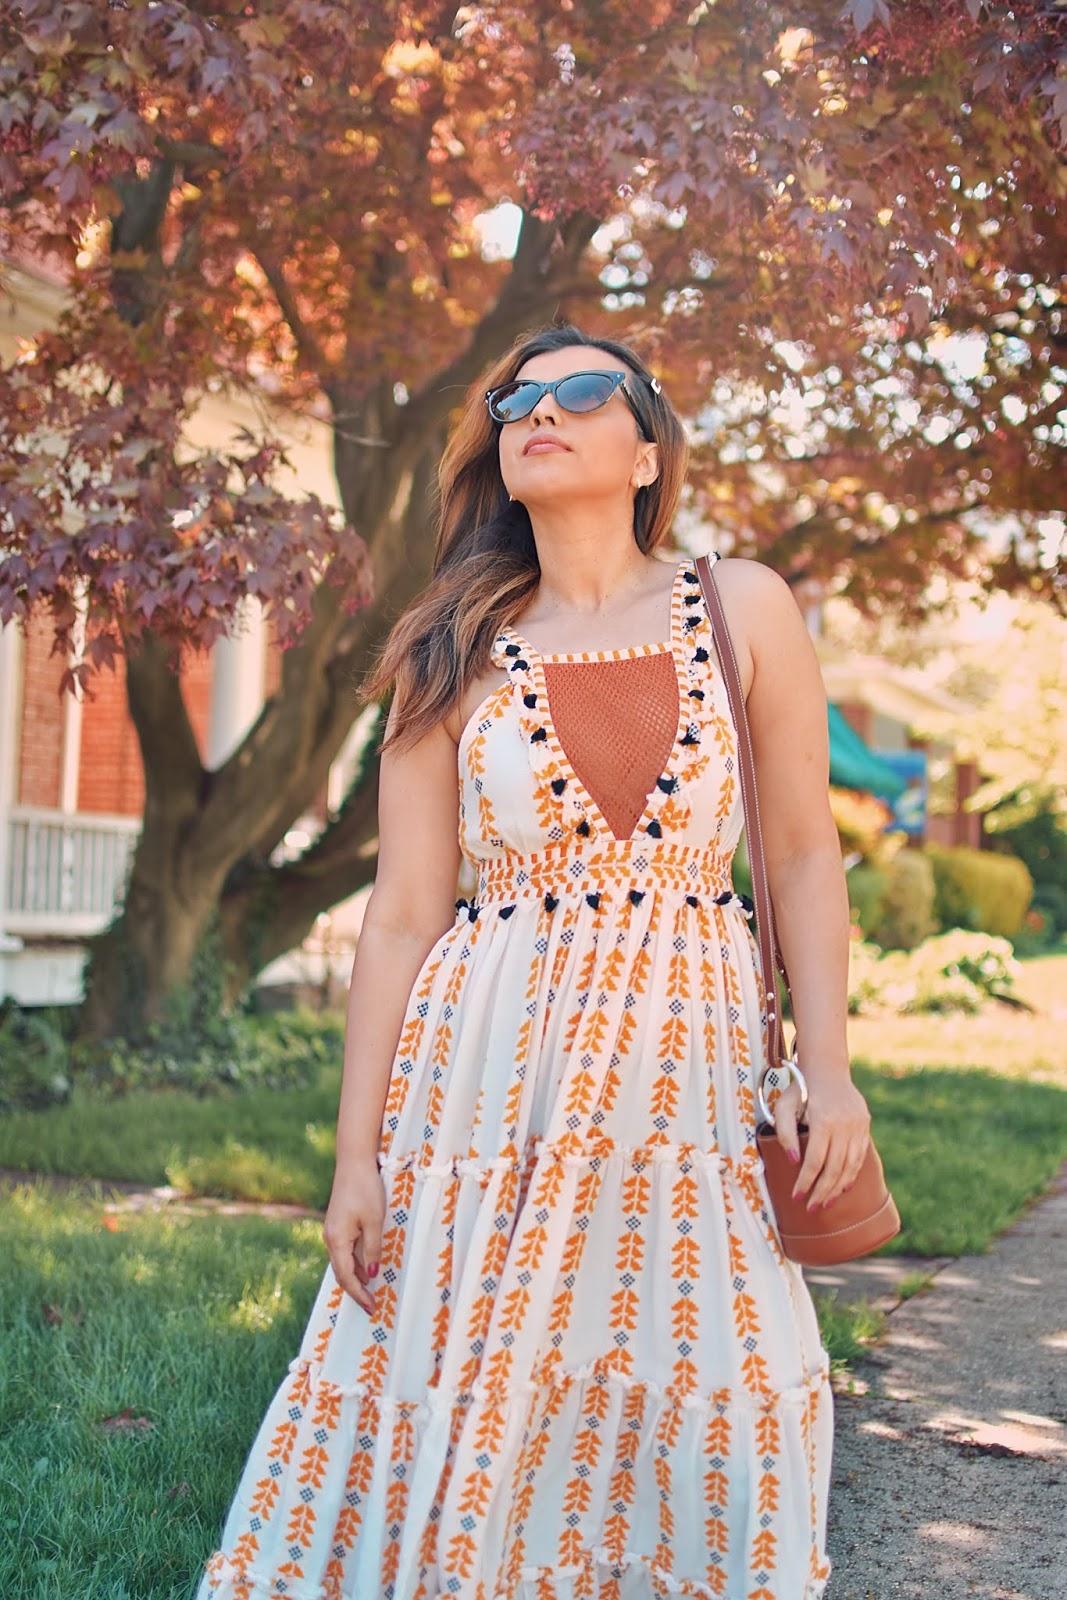 Llegamos al mes de mayo-rent the runway-mariestilo-primavera-dcblogger-dress-bolsos-designer bag-